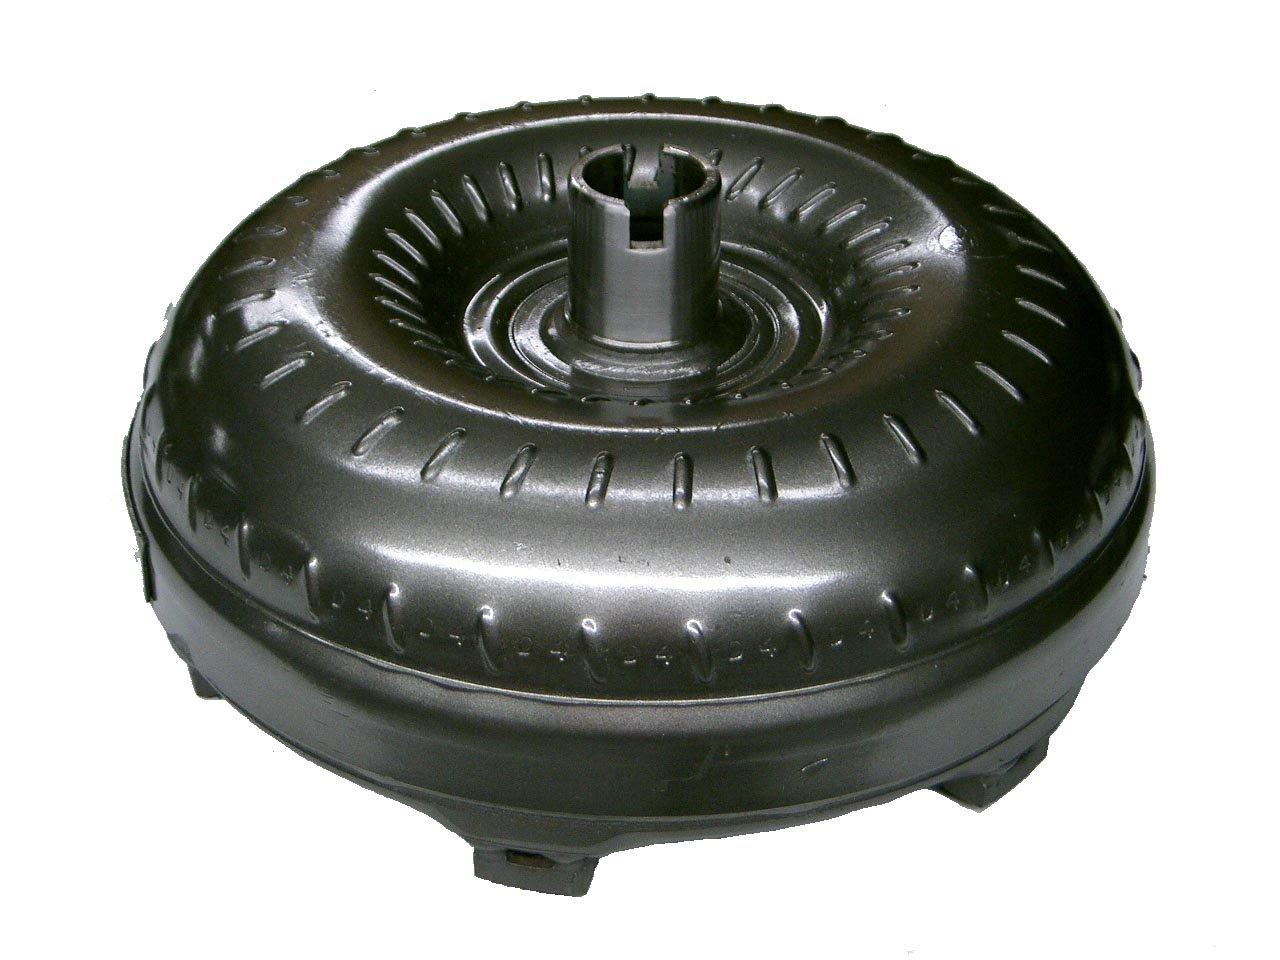 TORCO TH400 Chevy Turbo 400 - Heavy Duty Torque Converter 11.5 Bolt Circle Diameter